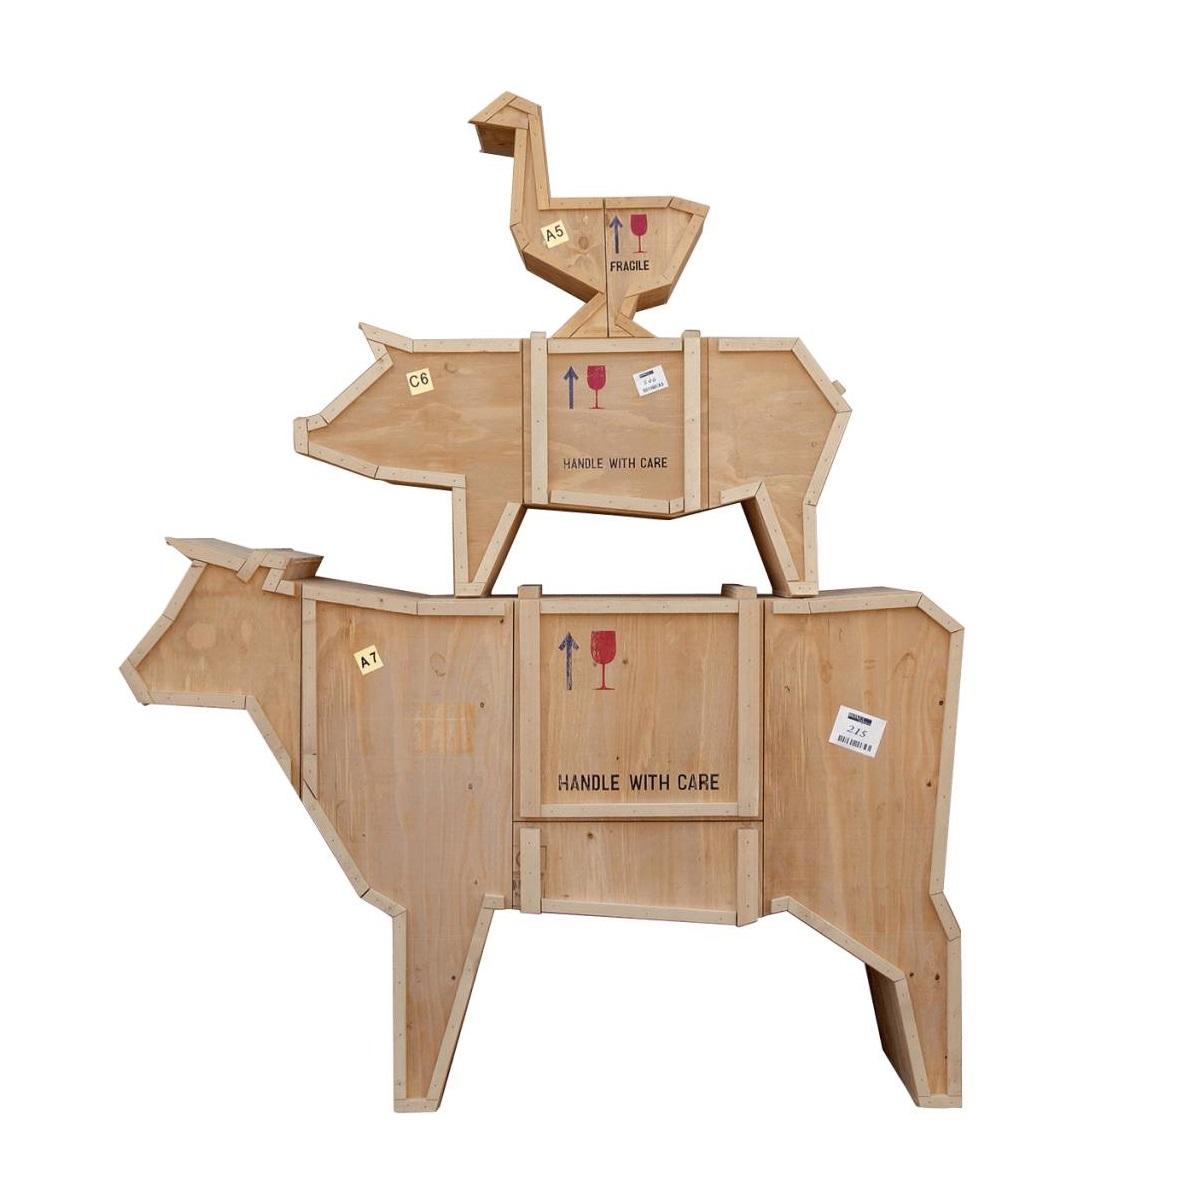 Sending animals polymorphic furniture cow seletti